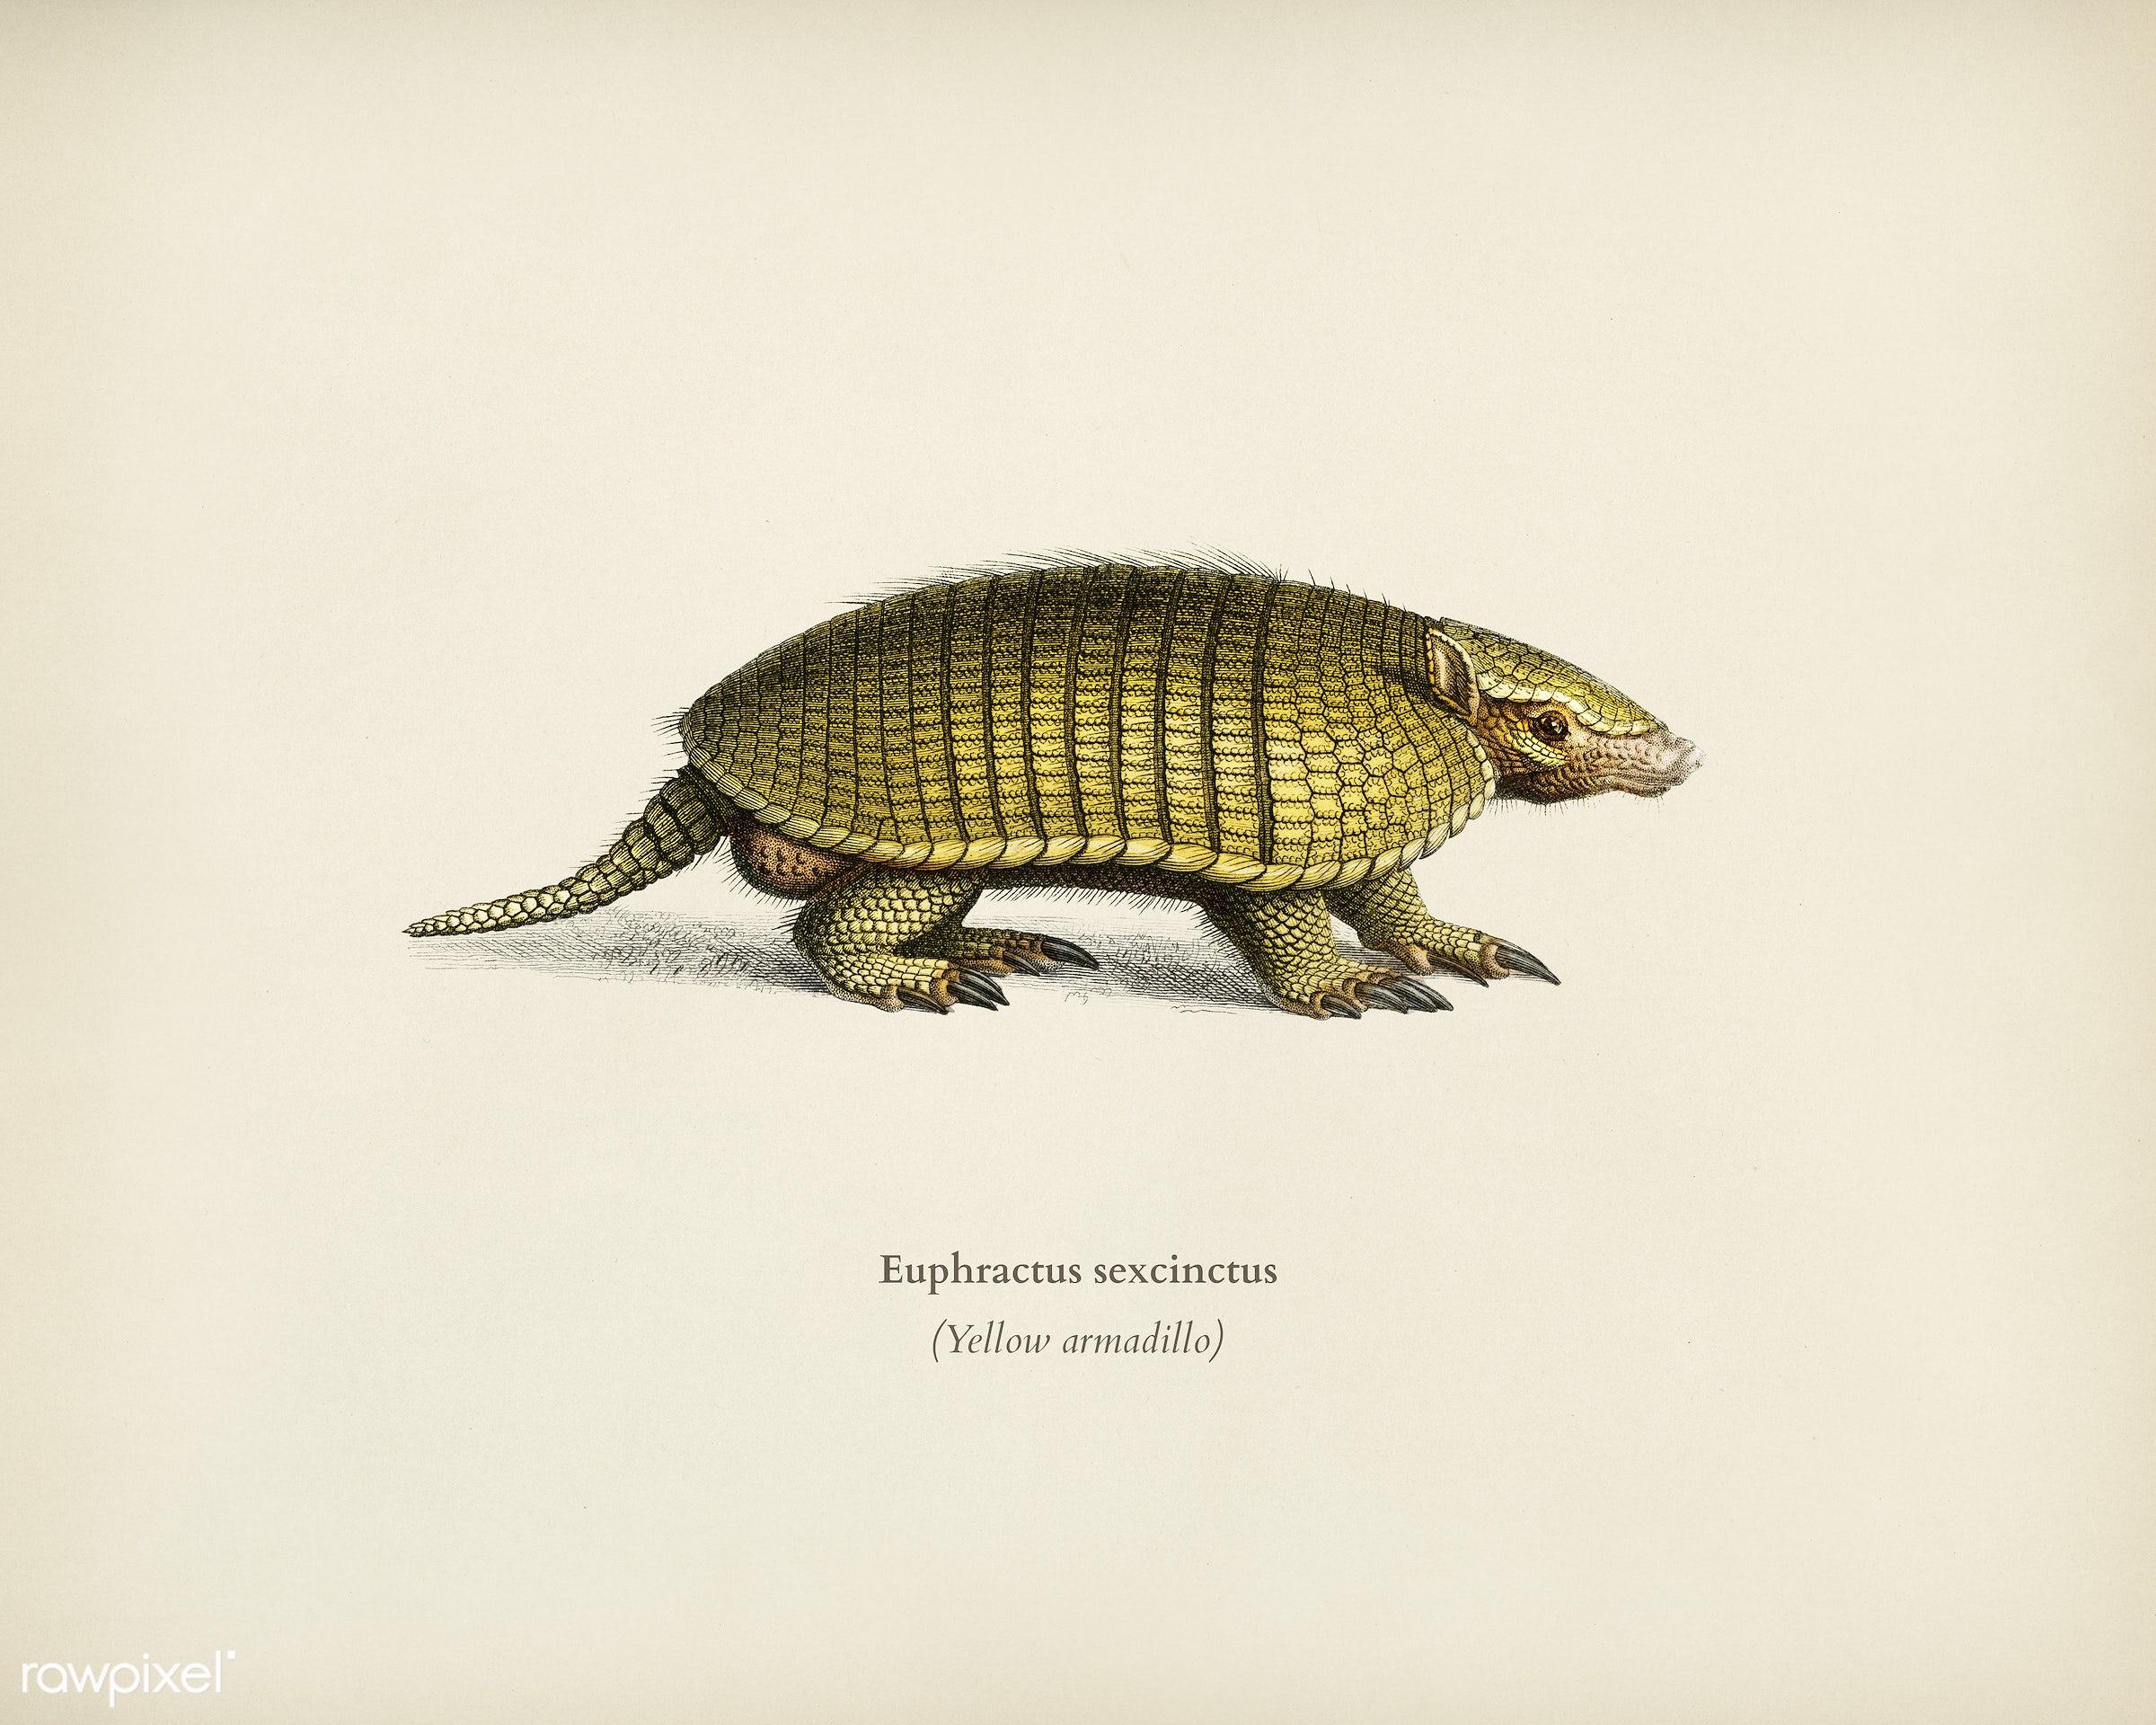 Yellow armadillo (Euphractus sexcinctus) illustrated by Charles Dessalines D' Orbigny (1806-1876). Digitally enhanced...